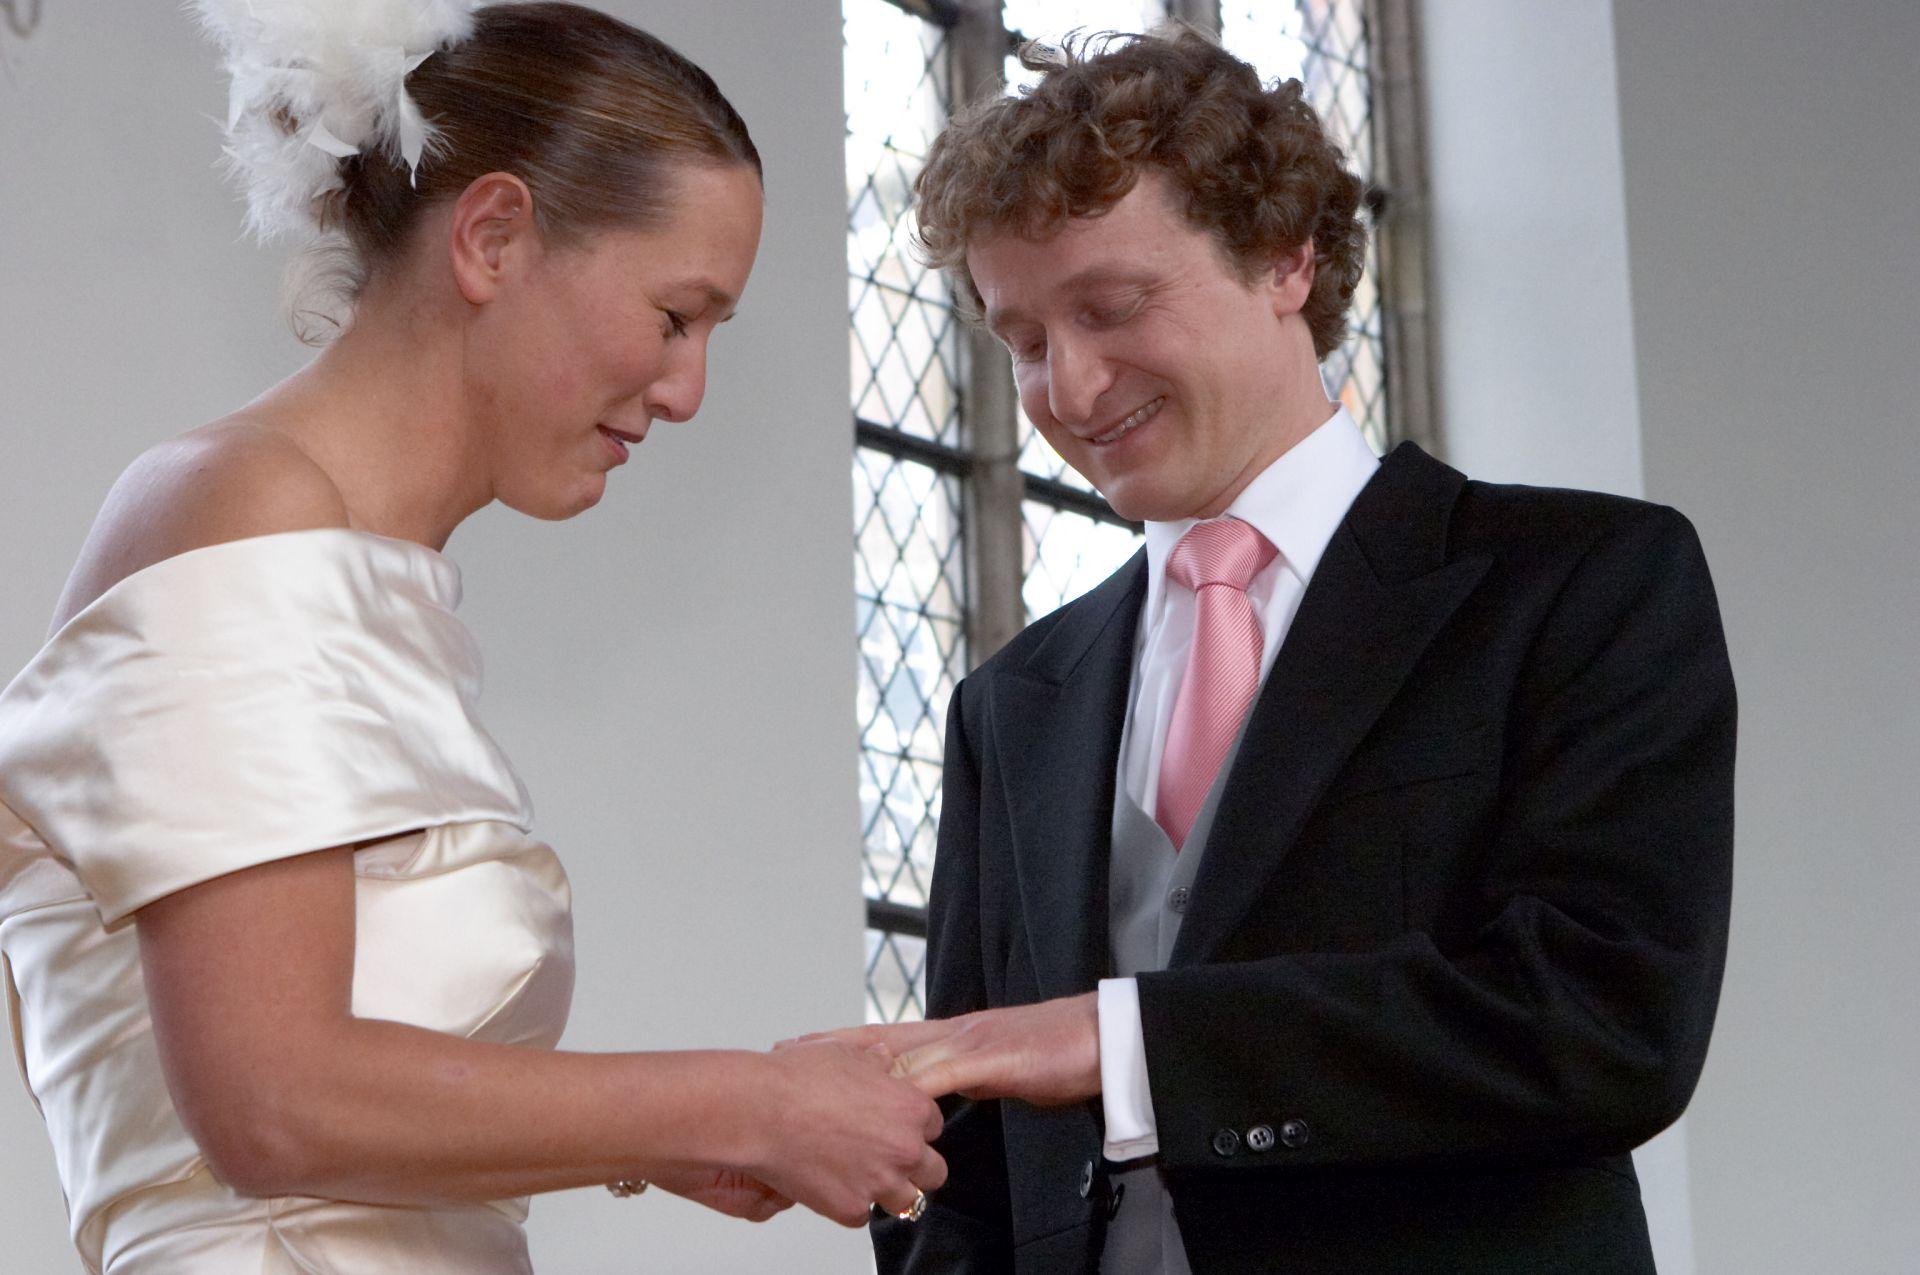 Bruiloft IV